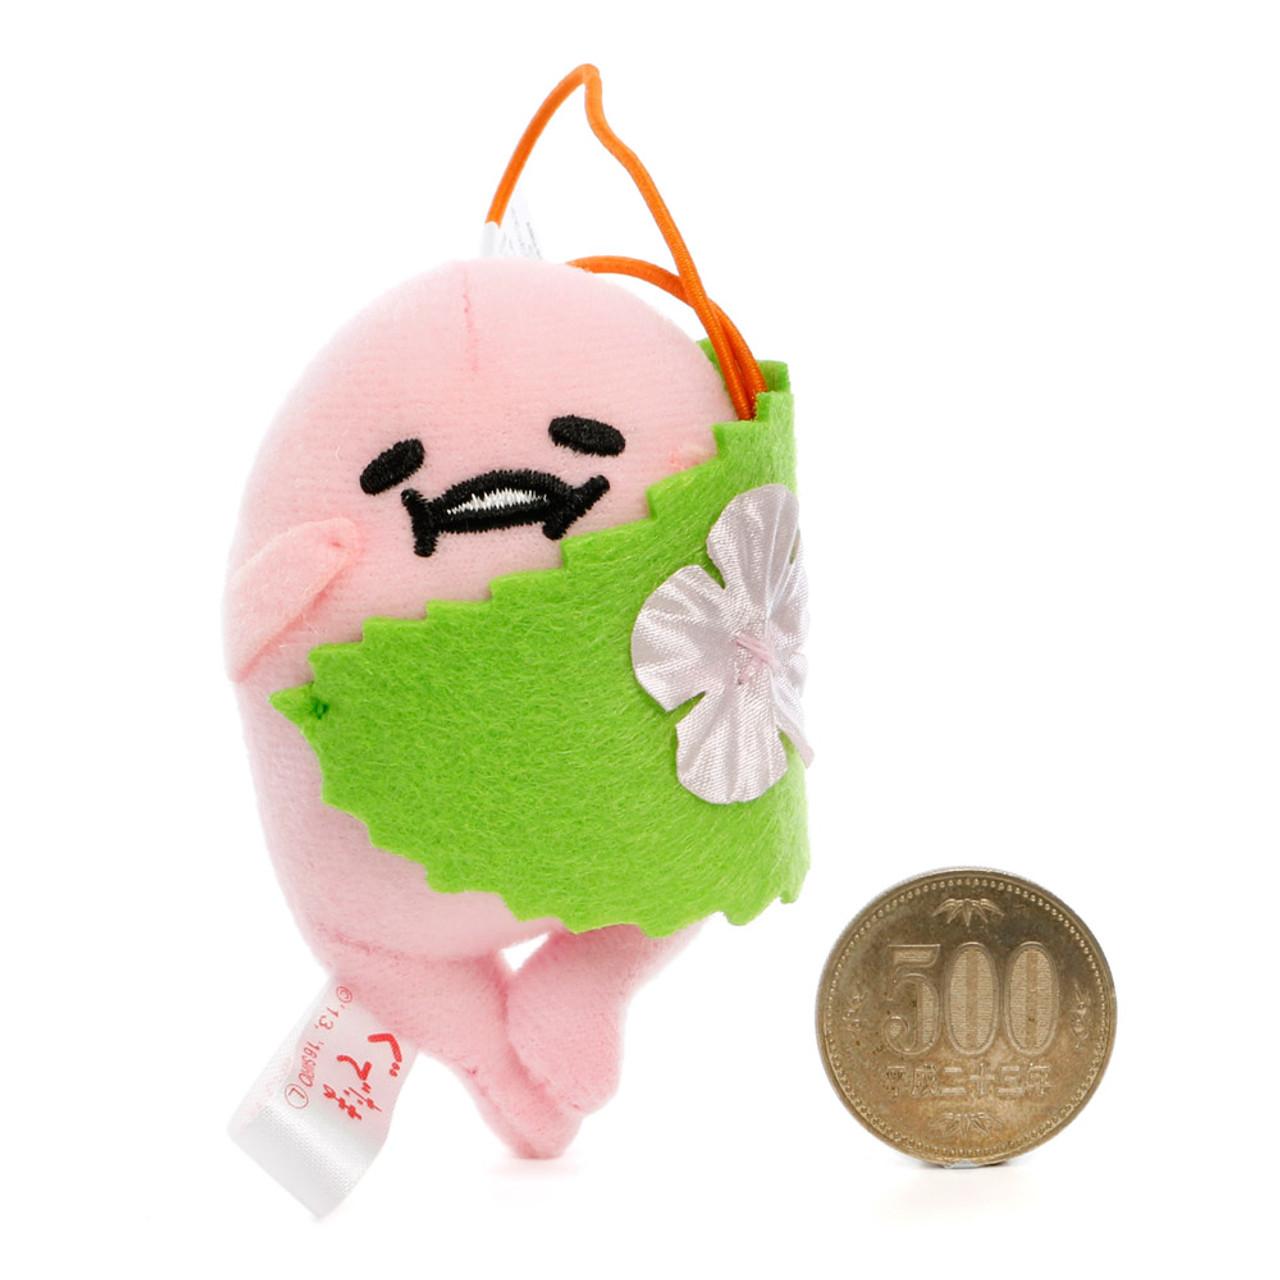 Sanrio Gudetama Lazy Egg Sakura Mascot Plush Charms - Cherry Blossom Rice Cake ( Proportion )